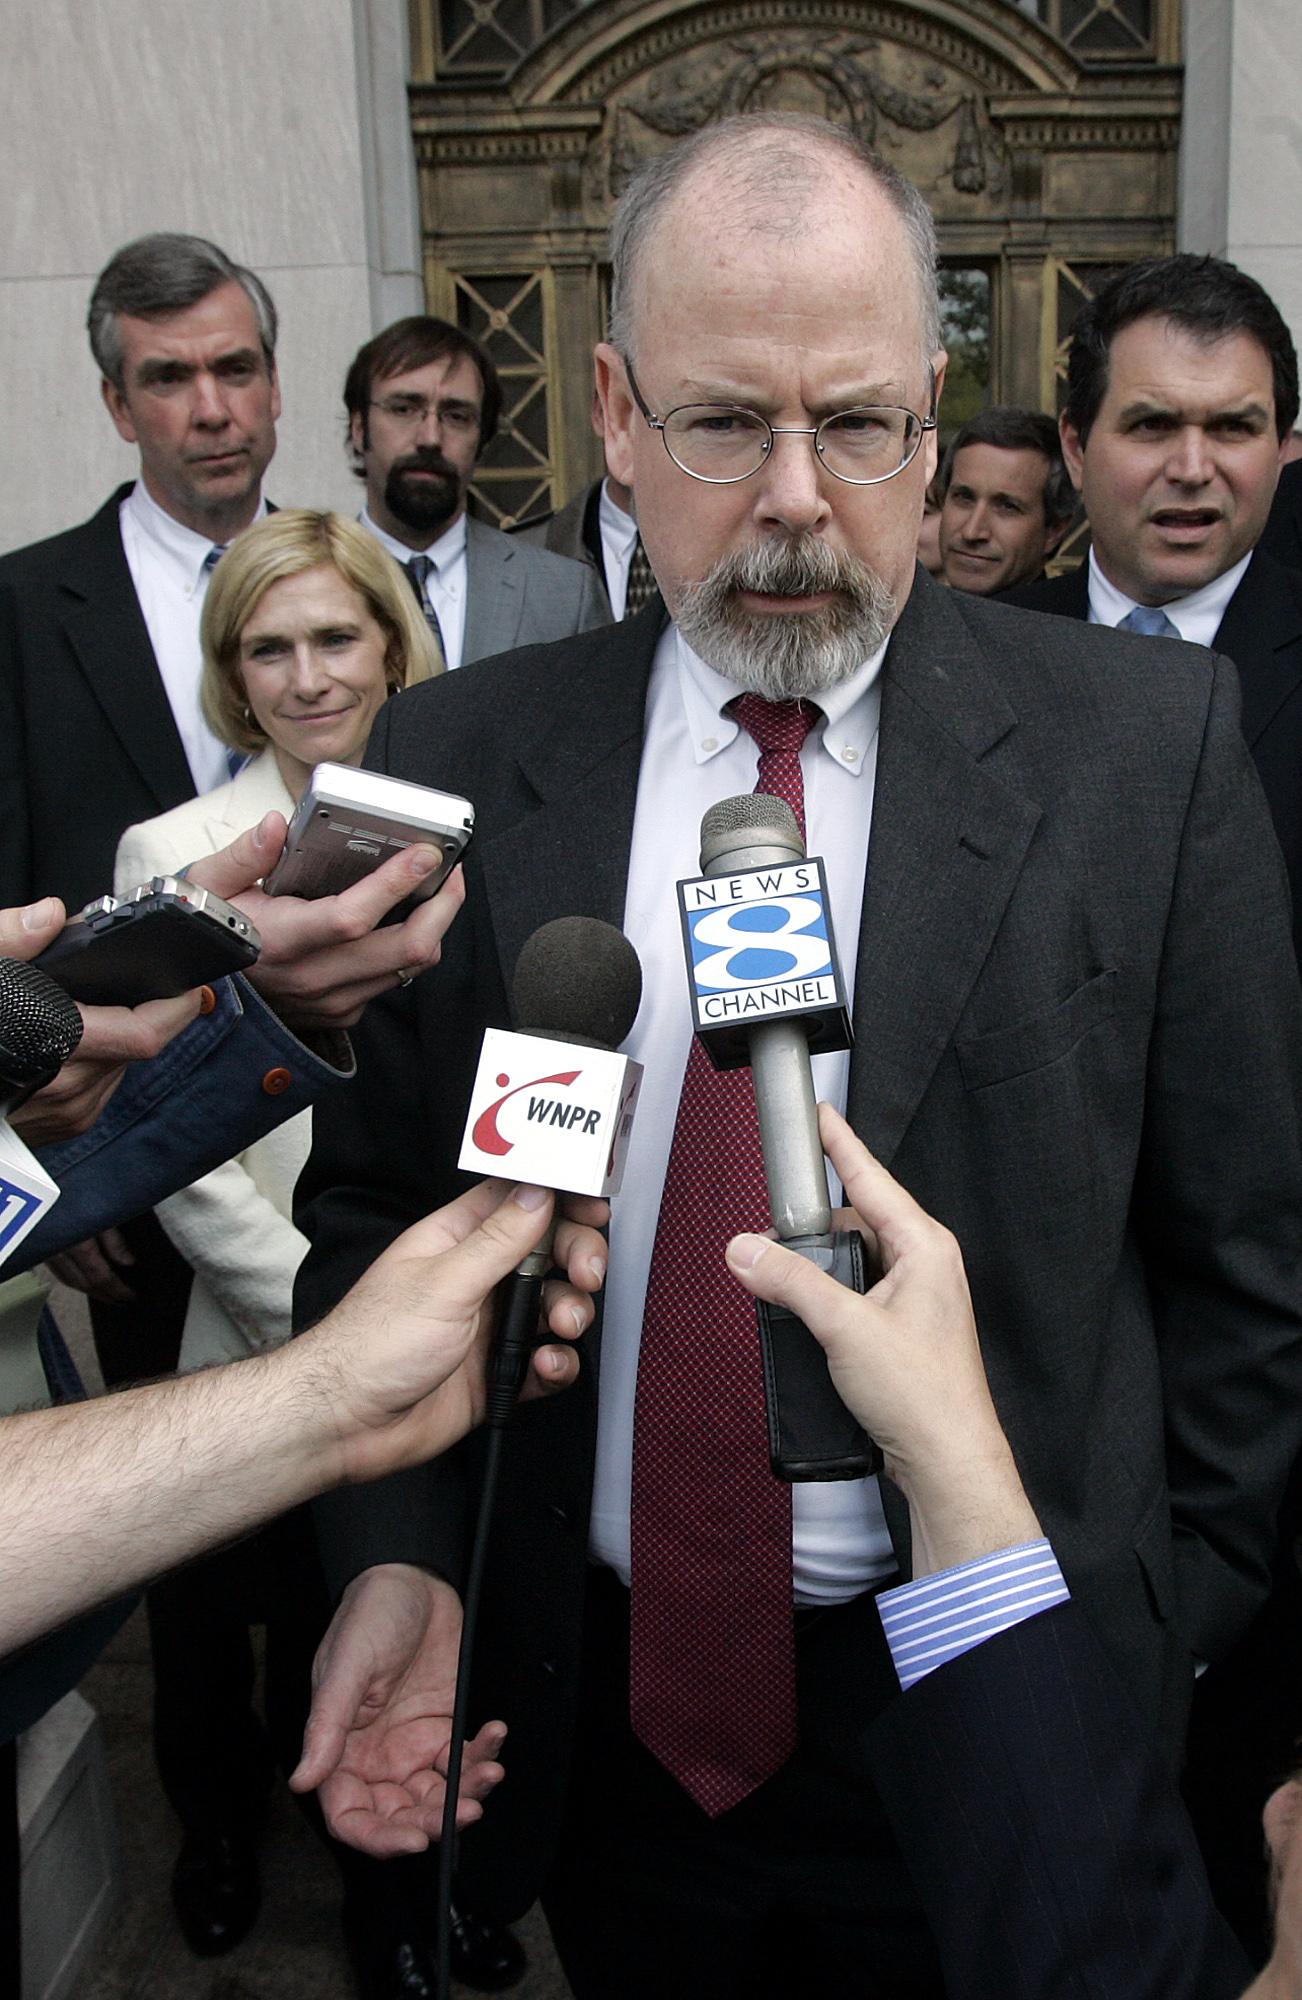 John Durham pressed to probe Robert Mueller and his Democrat-aligned prosecutors